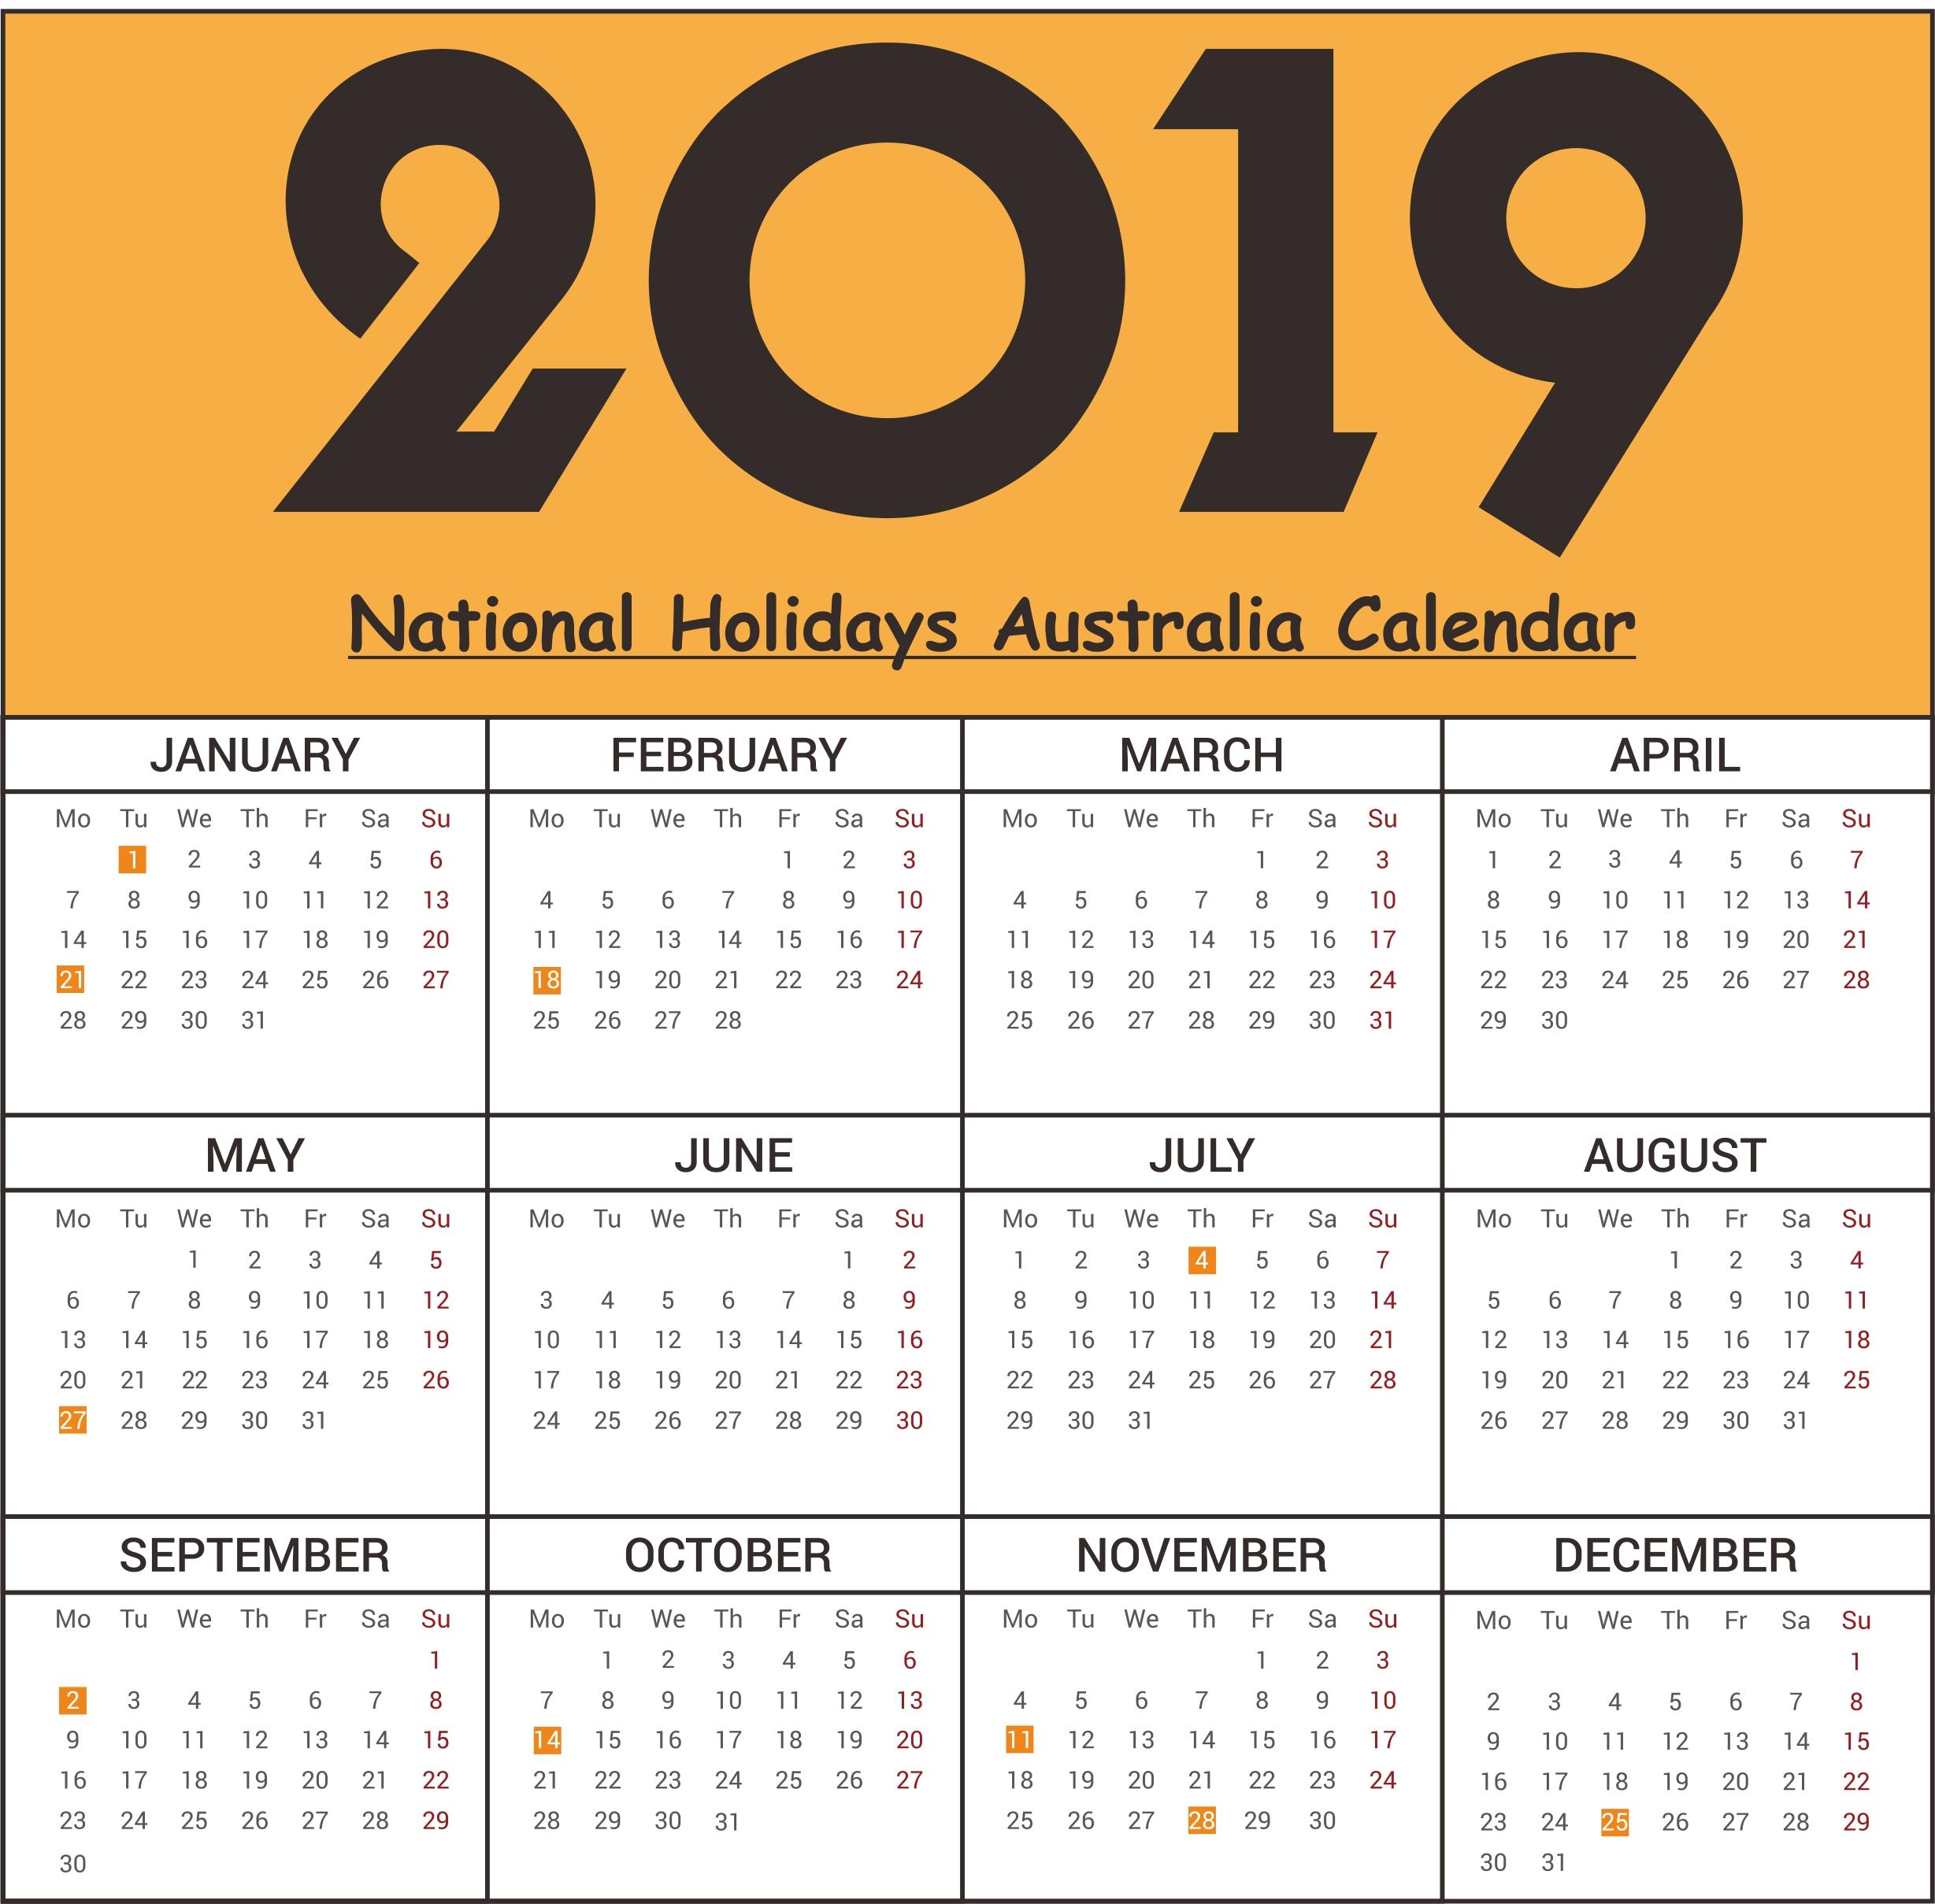 Free Australia National Holidays 2019 Calendar Templates | Free Calendar Public Holidays Nsw